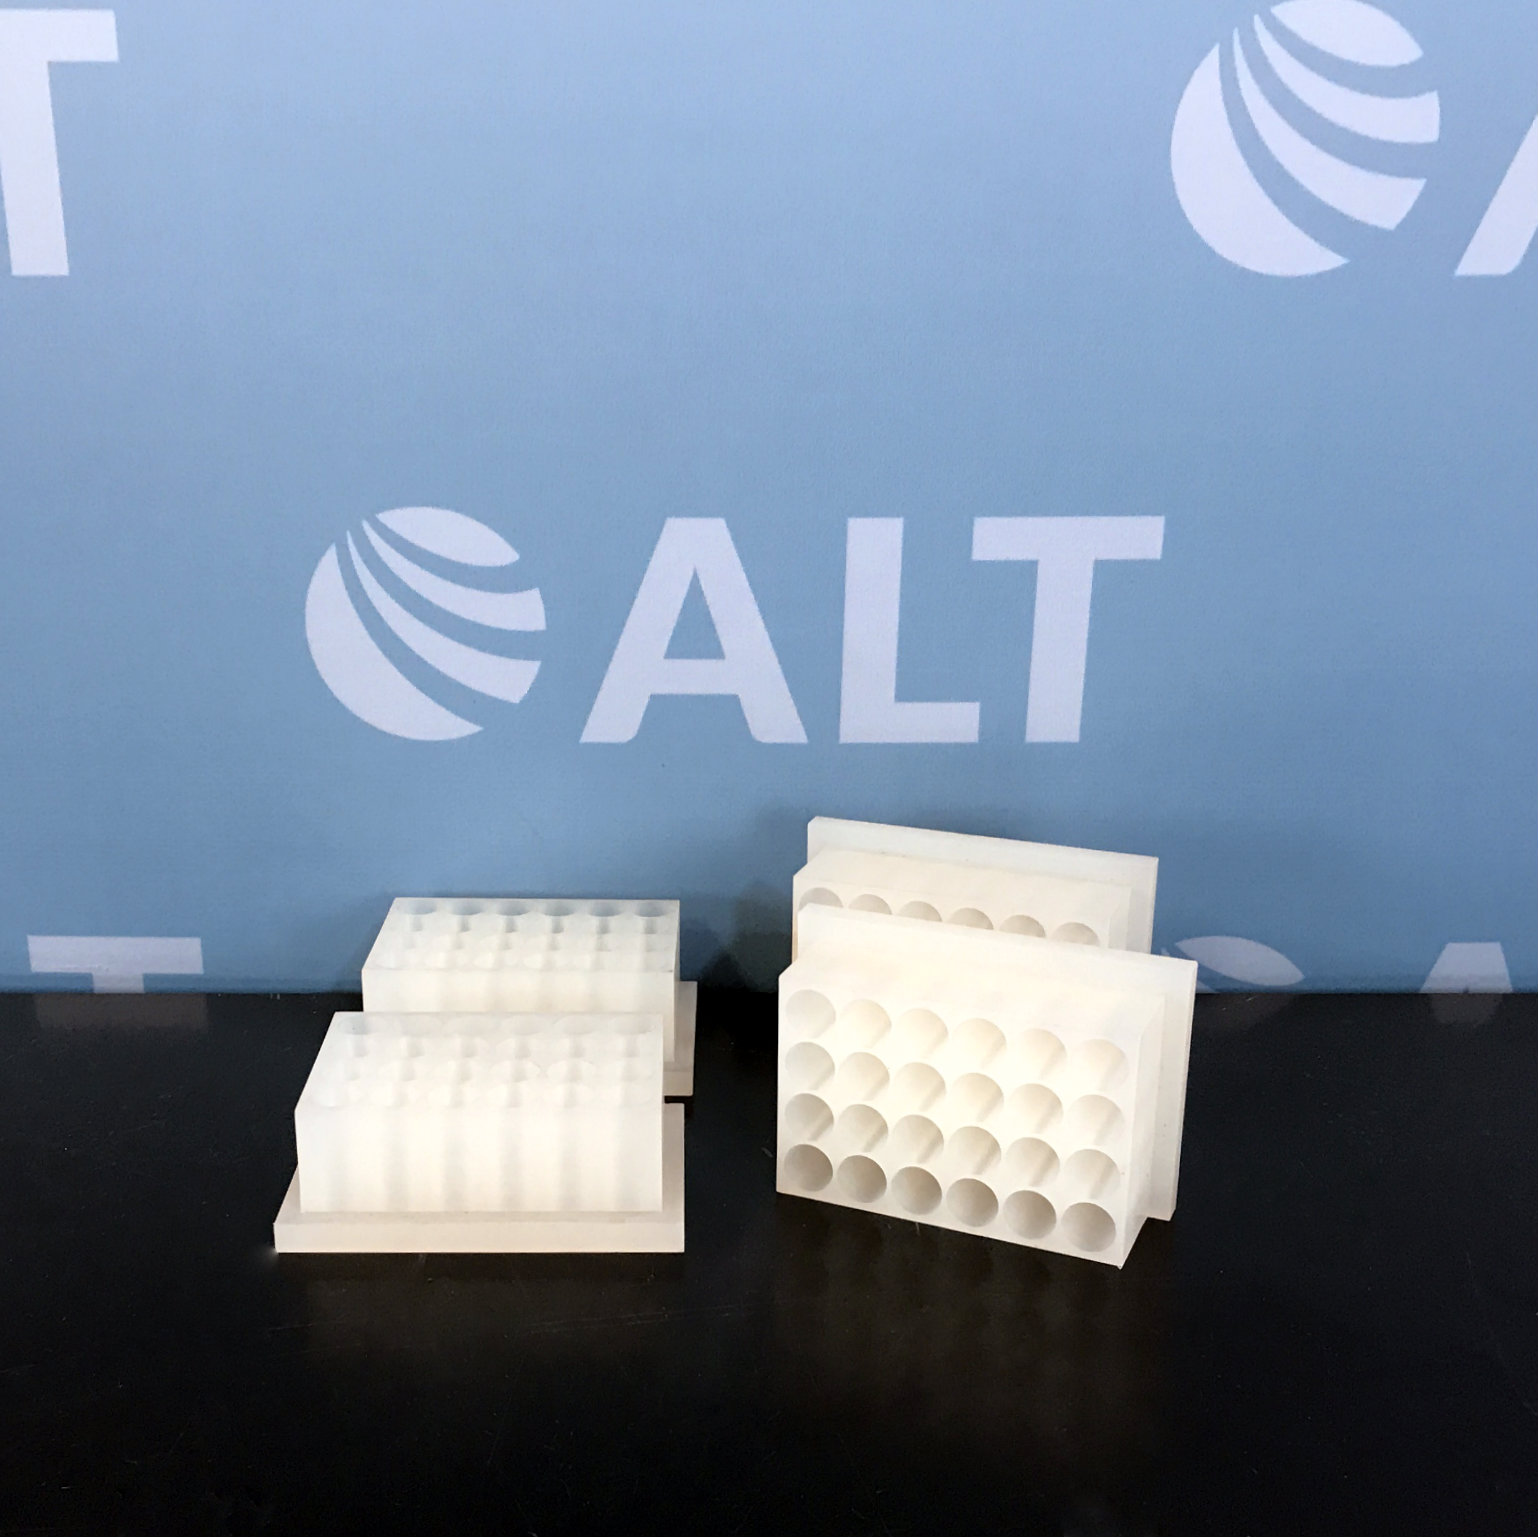 Thermo / Savant RBA24-16-100 Polypropylene Rotor Blocks Image